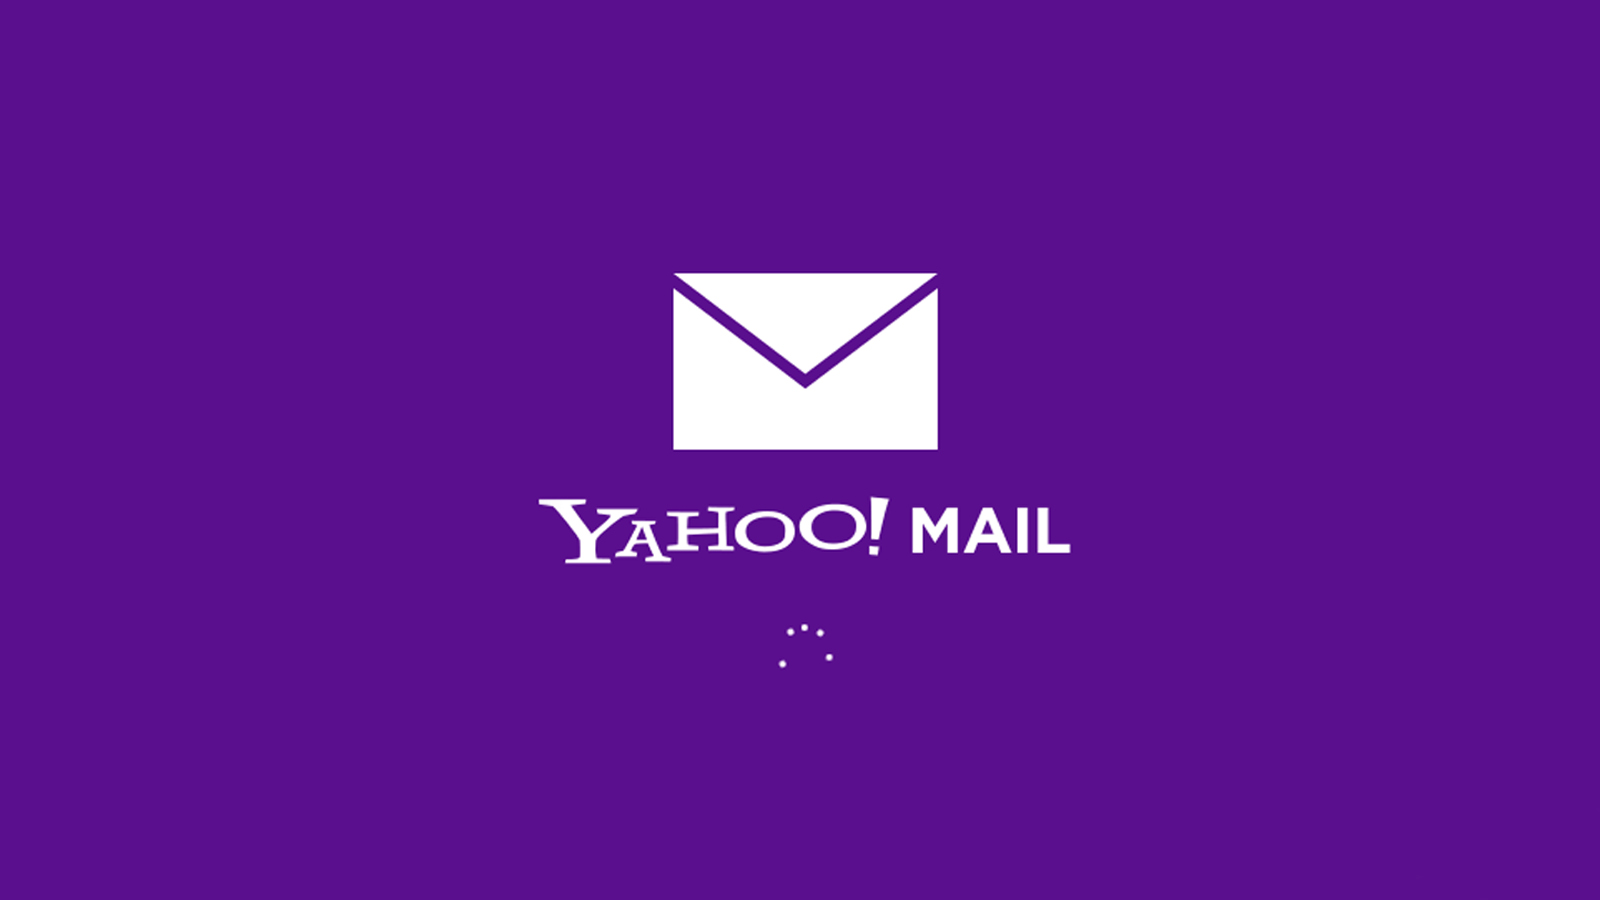 Yahoo Mail Logo Wallpaper 63930 1600x900px 1600x900